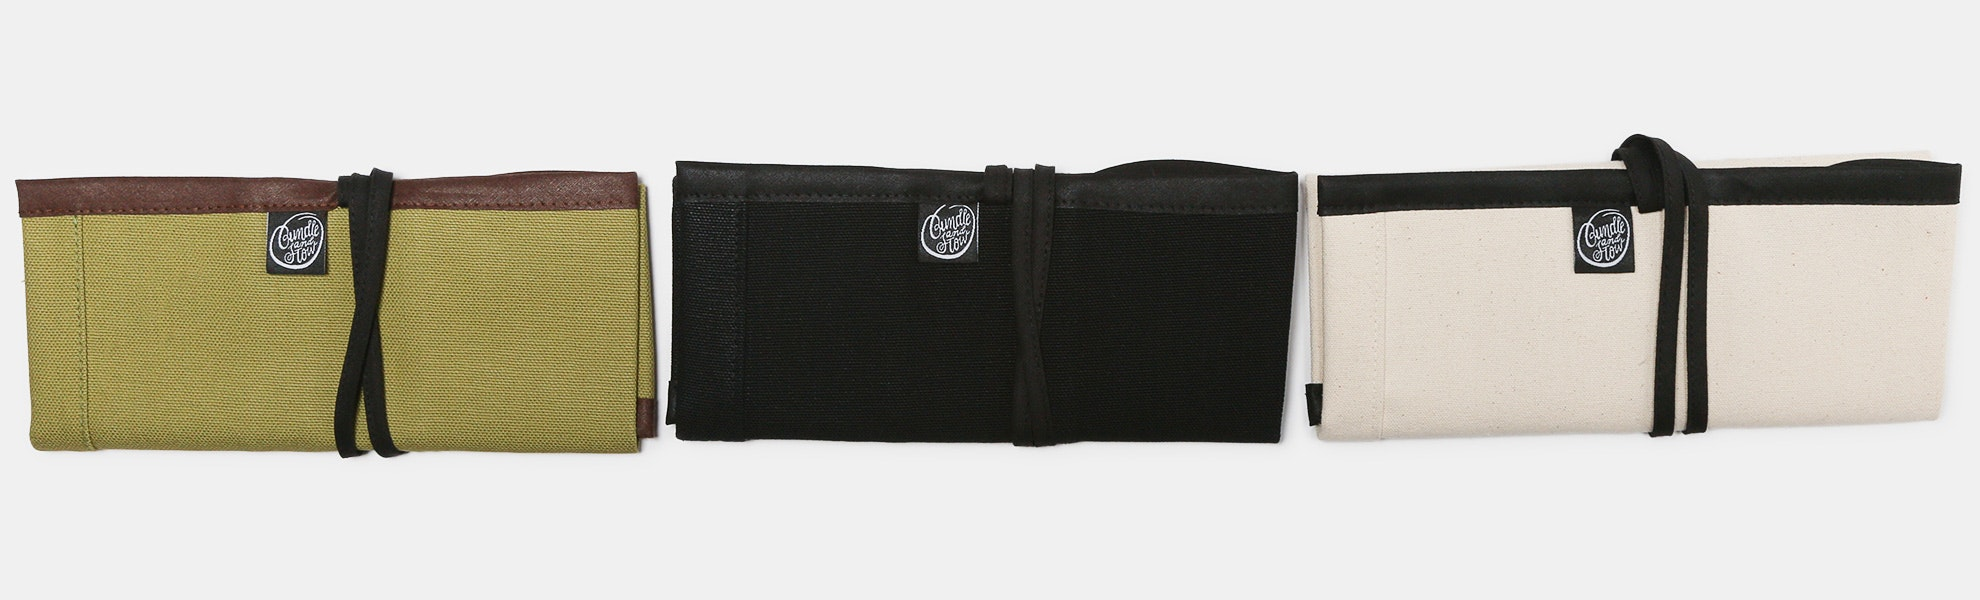 Bundle and Stow Medium Organizer Roll-Up